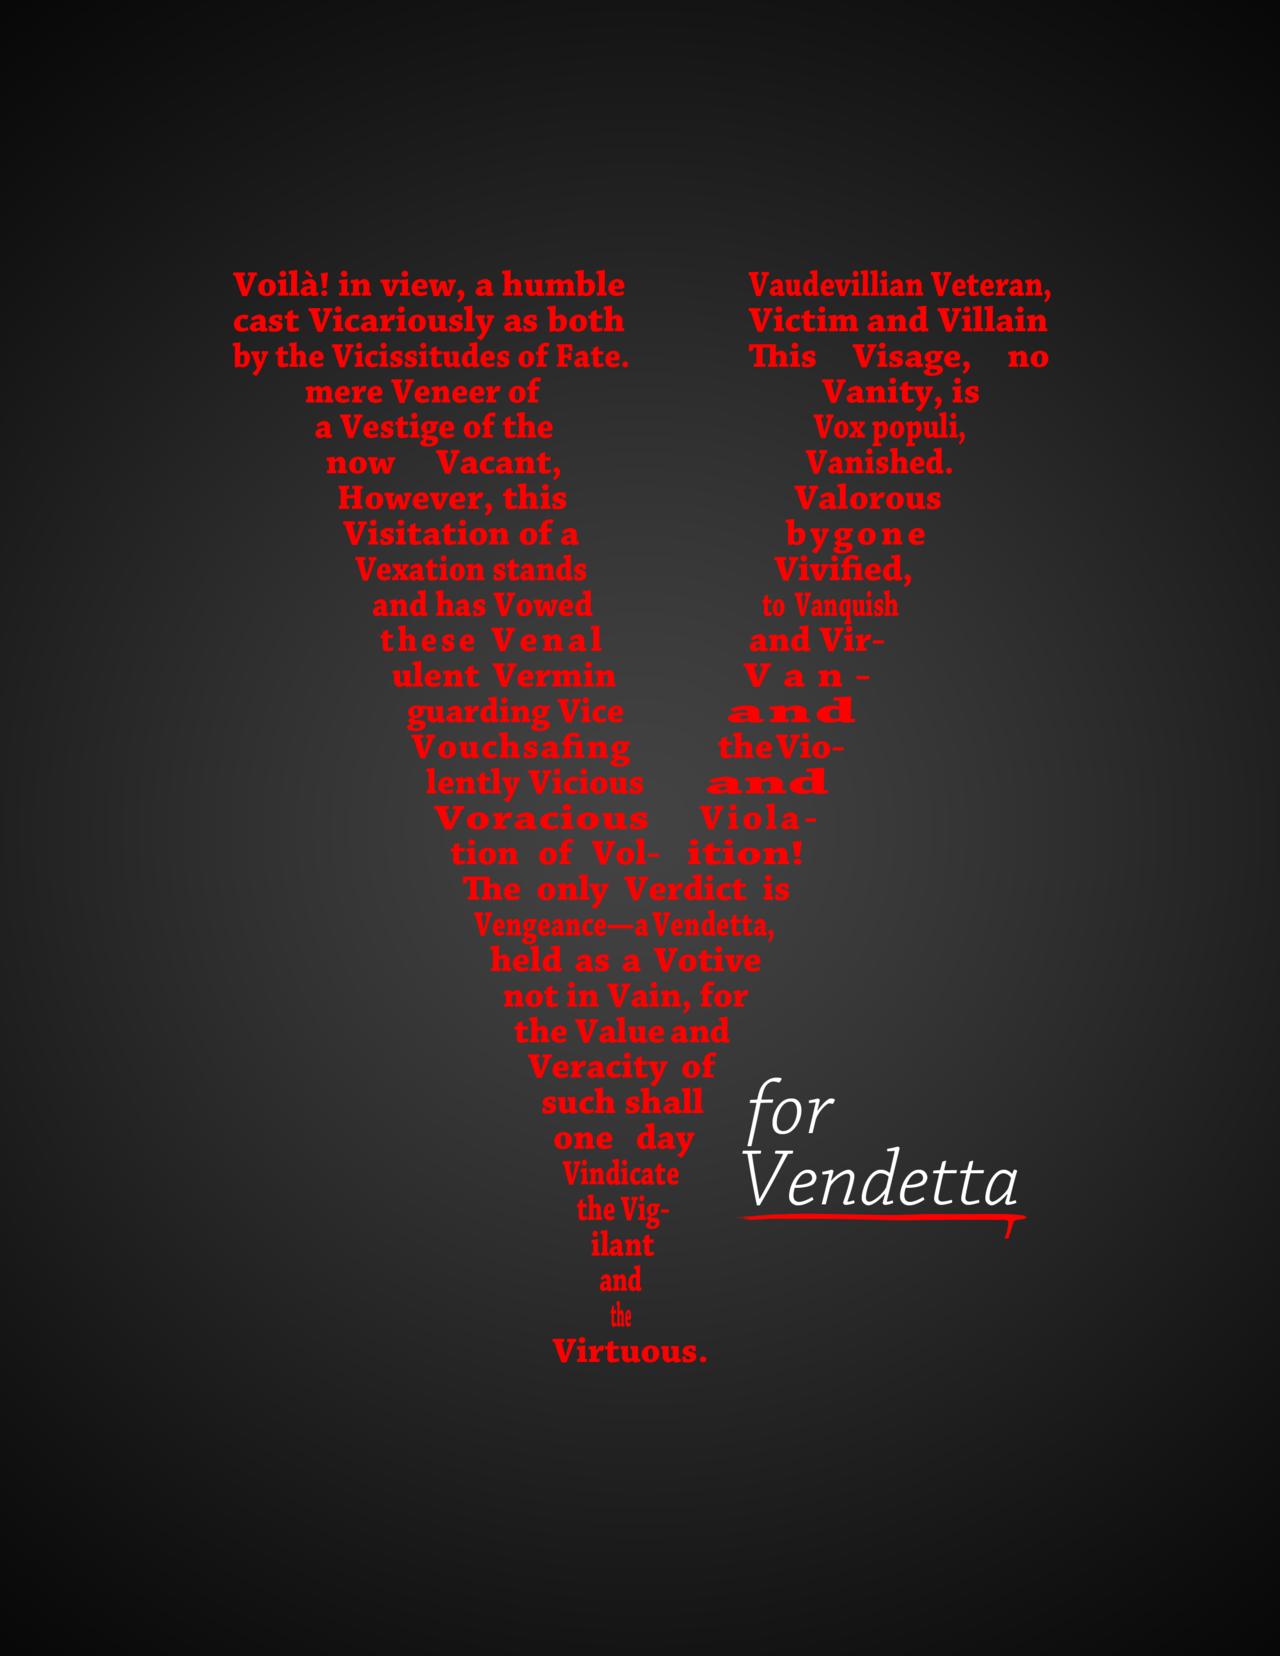 v for vendetta speech text